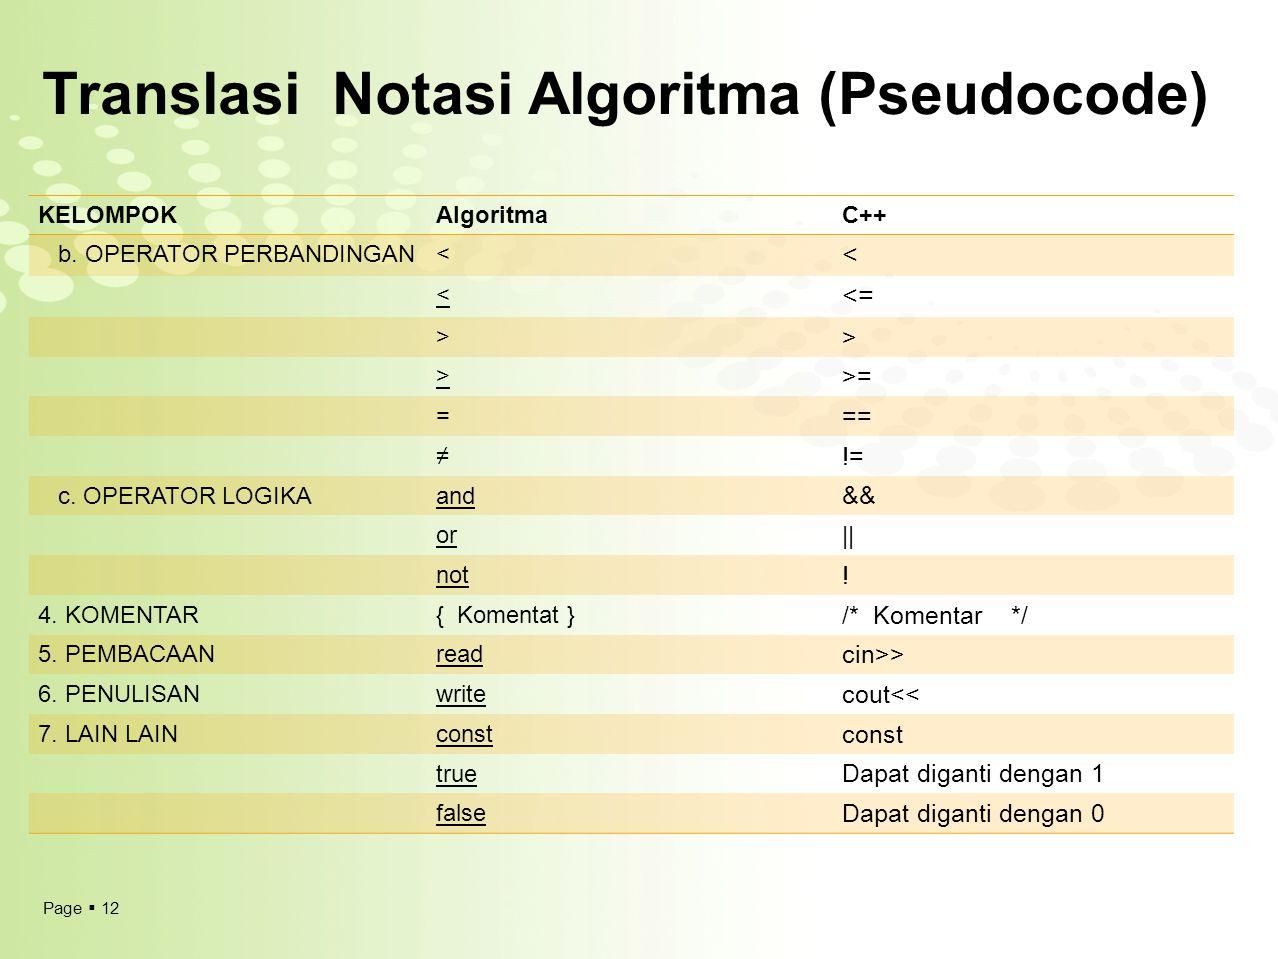 Translasi Notasi Algoritma (Pseudocode)